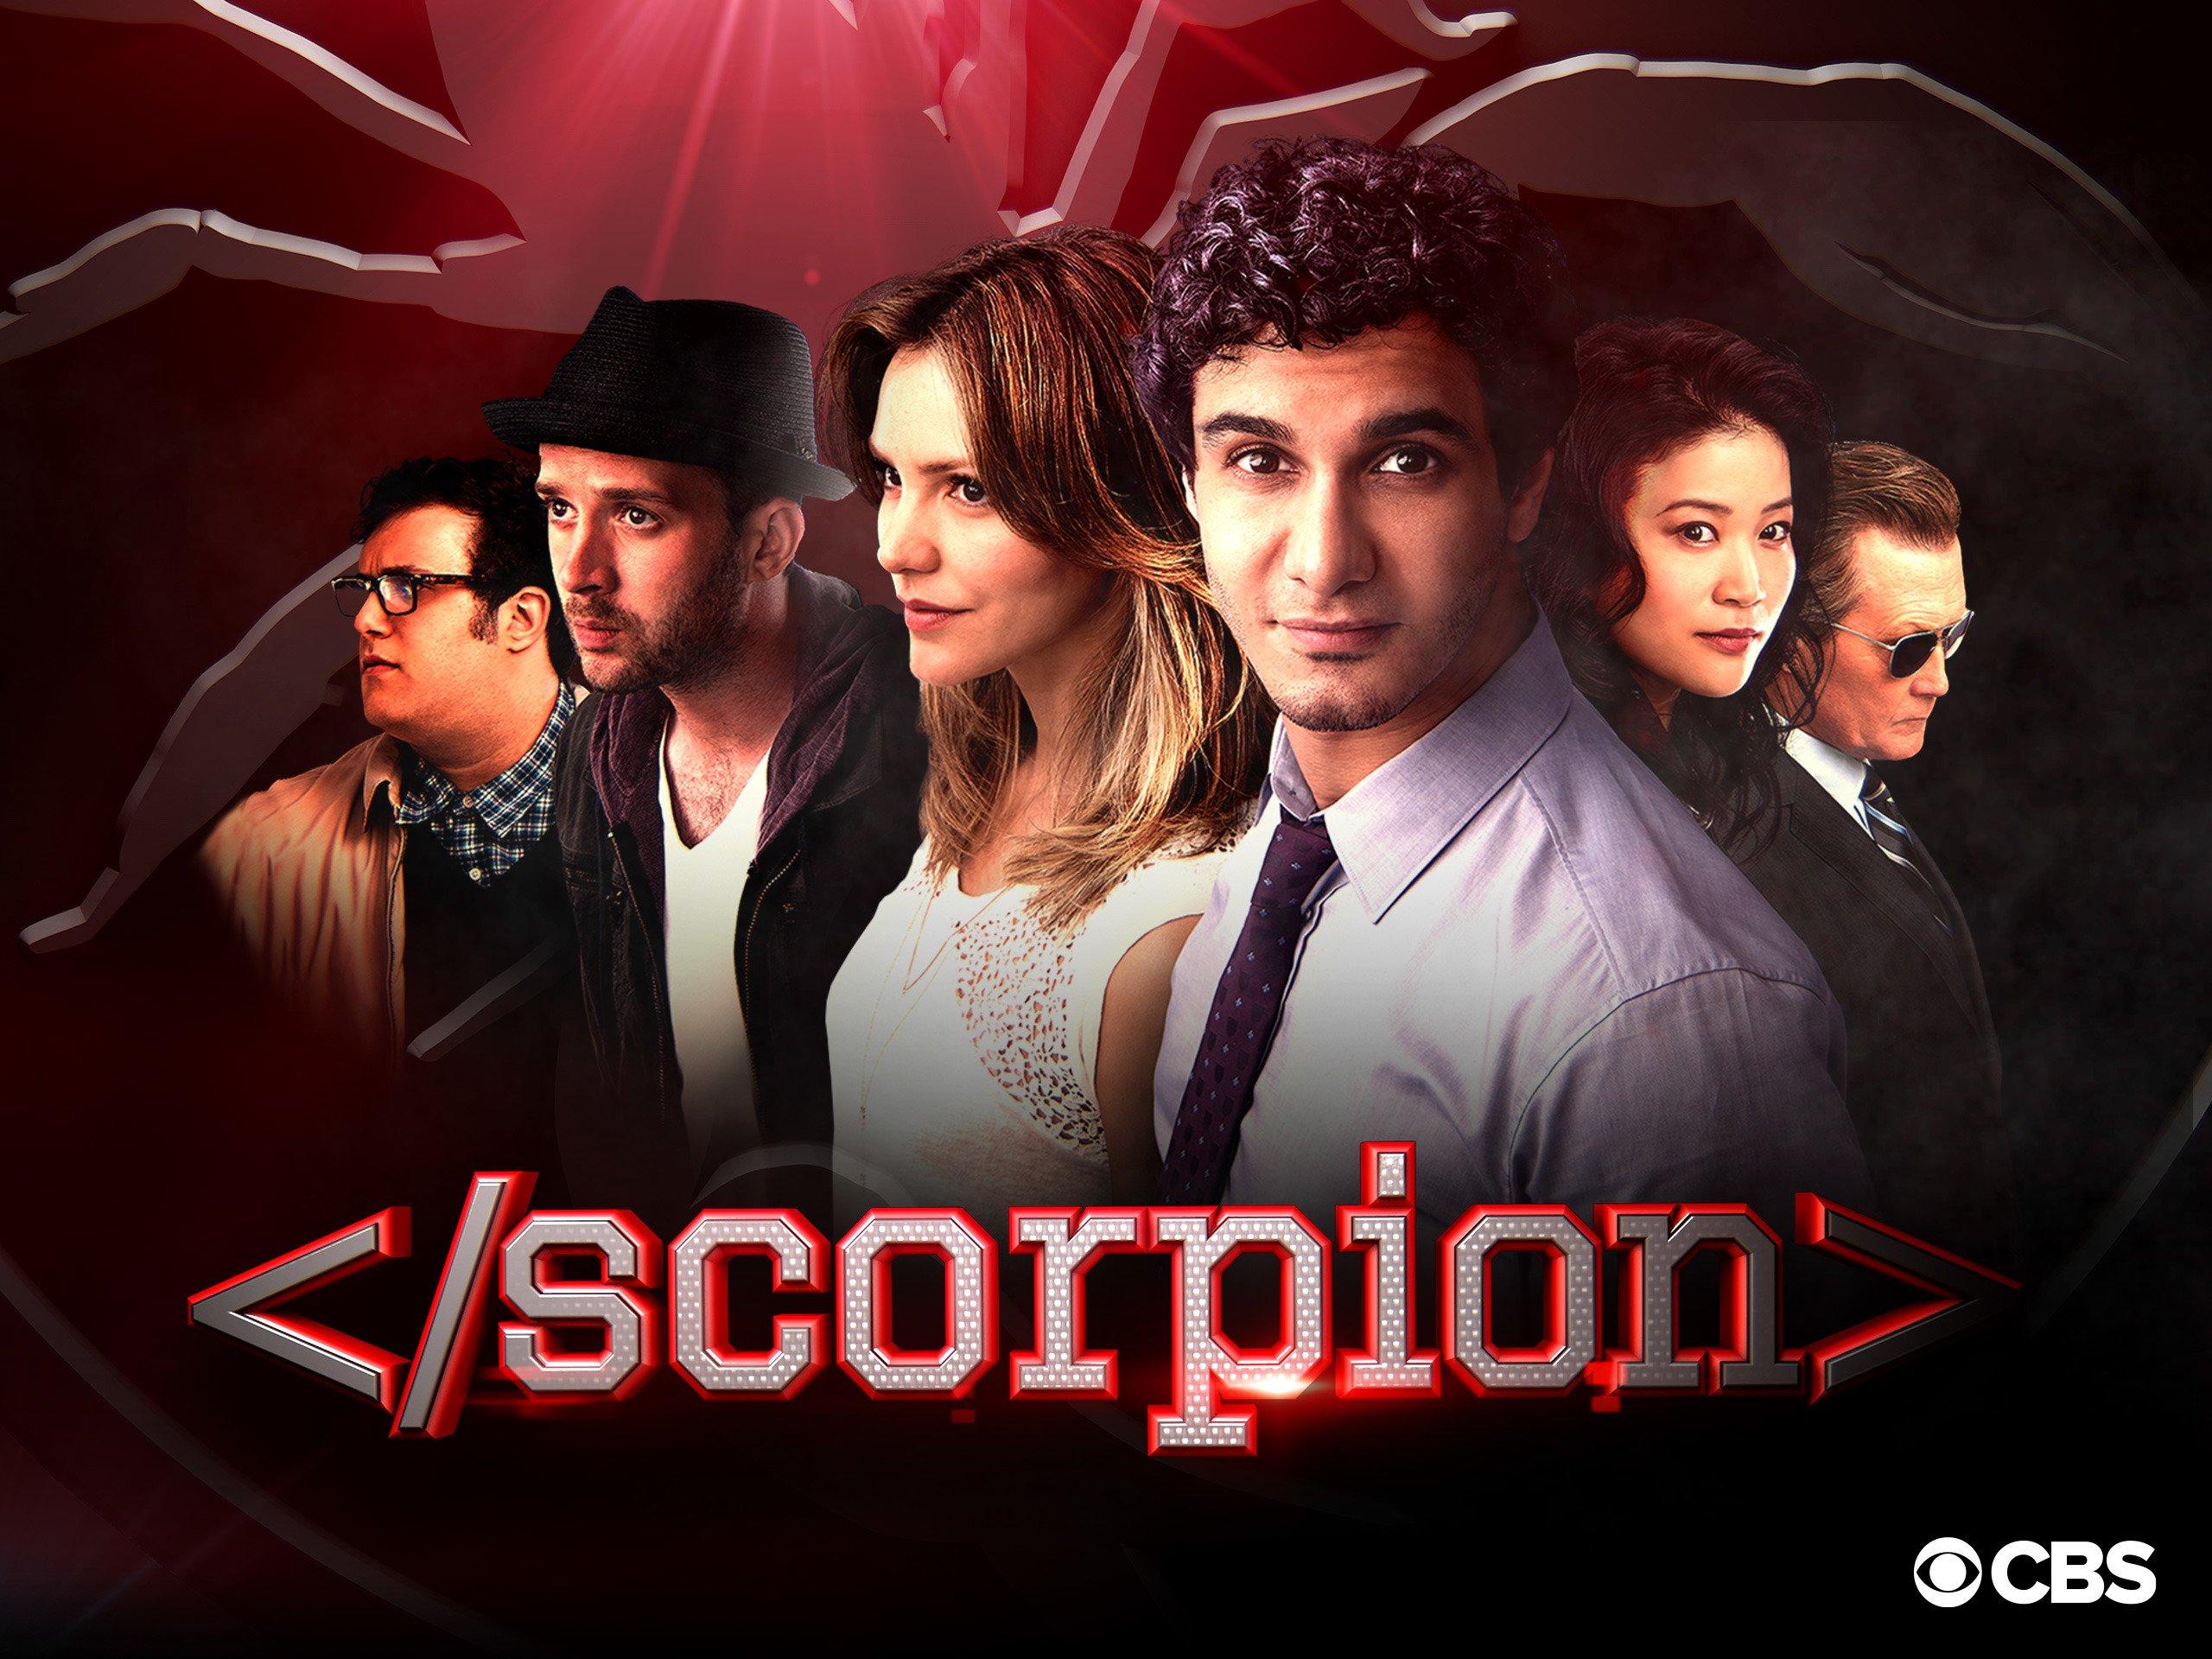 scorpion season 3 free download